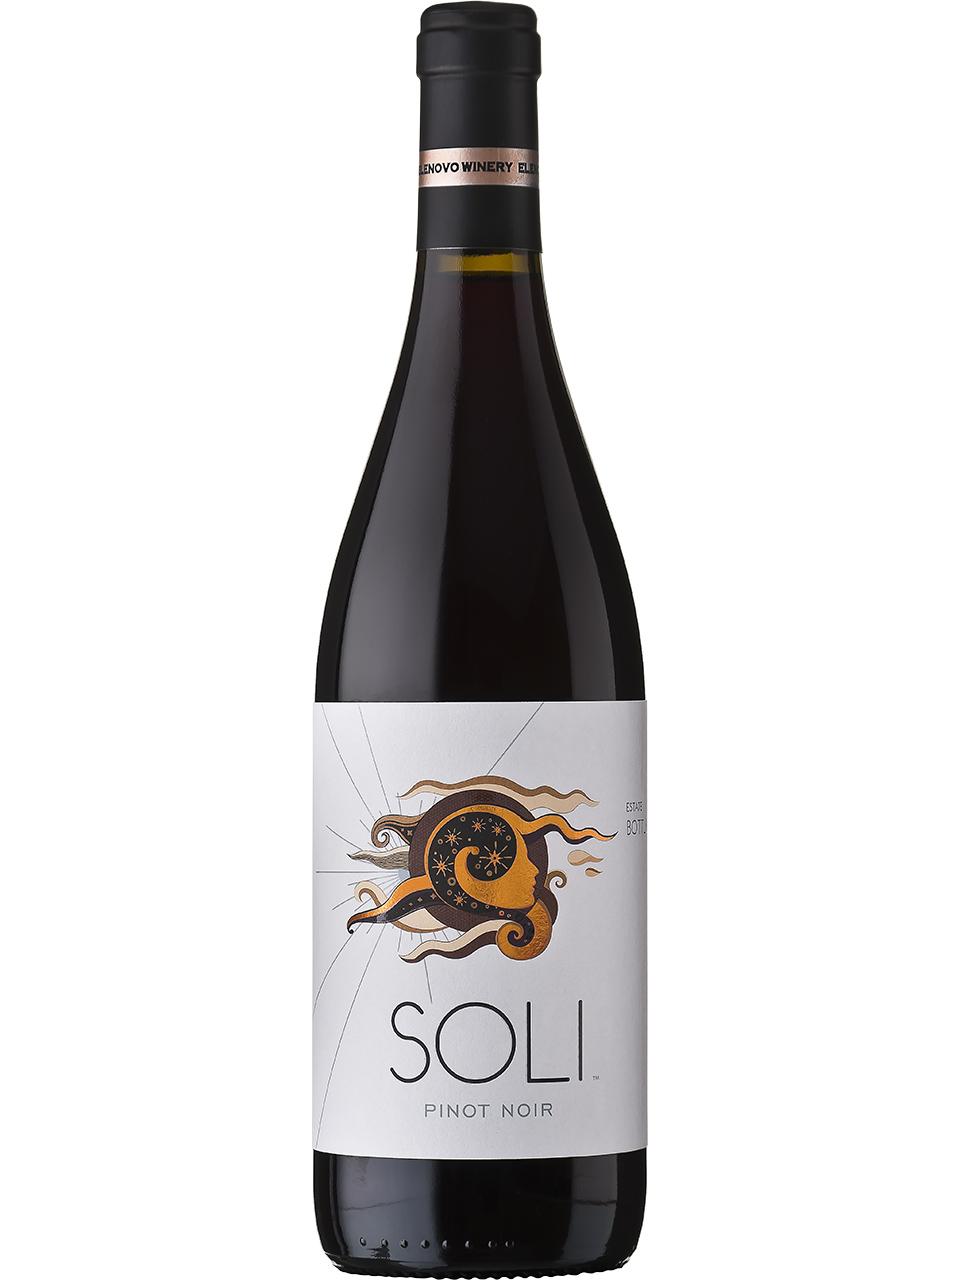 Soli Pinot Noir